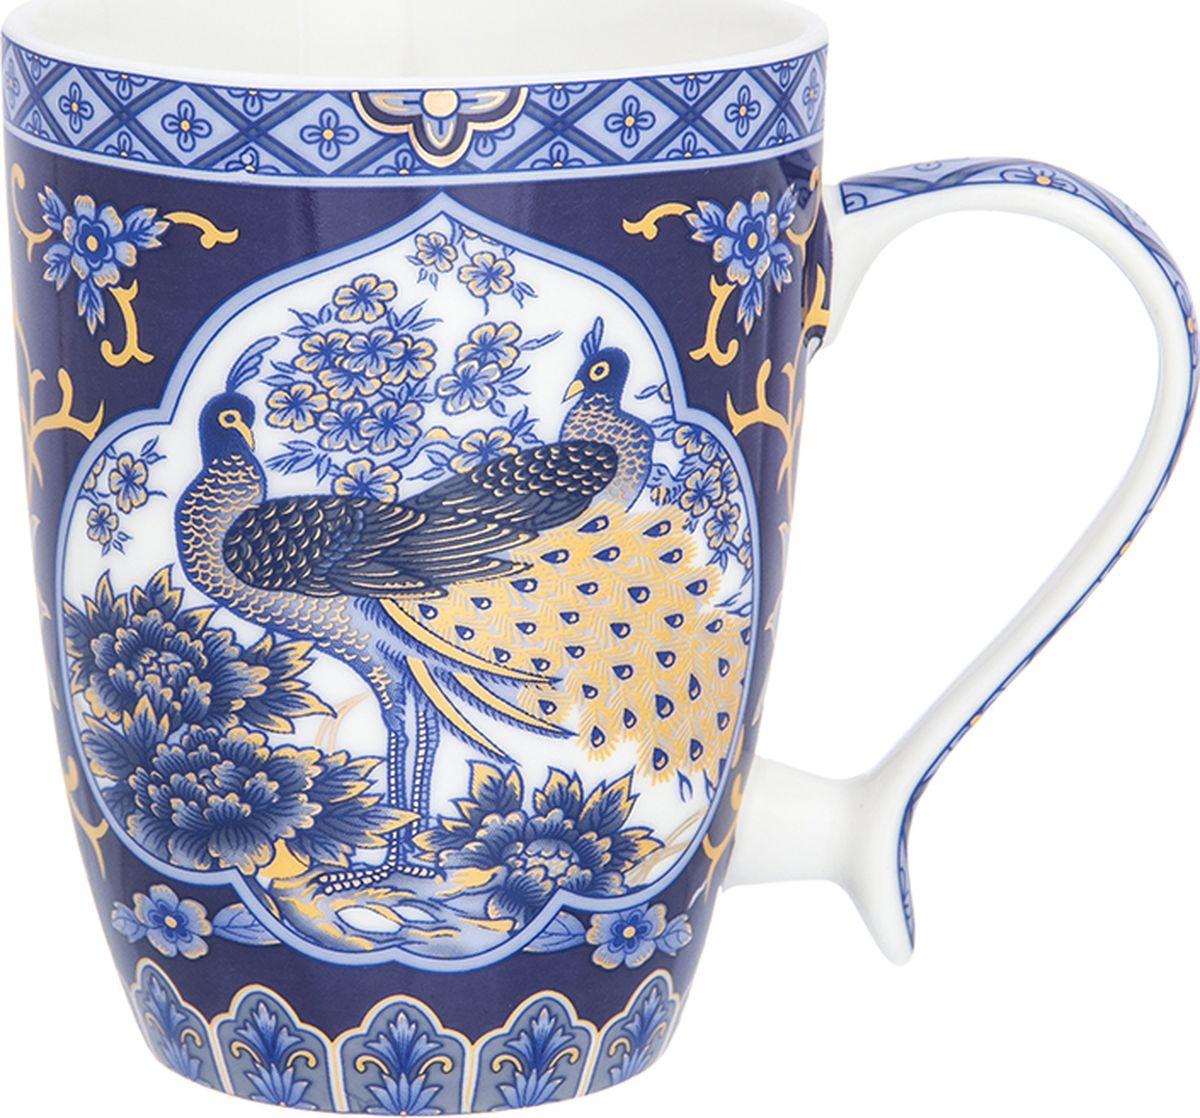 Кружка Elan Gallery Павлин синий, 300 мл. 181052